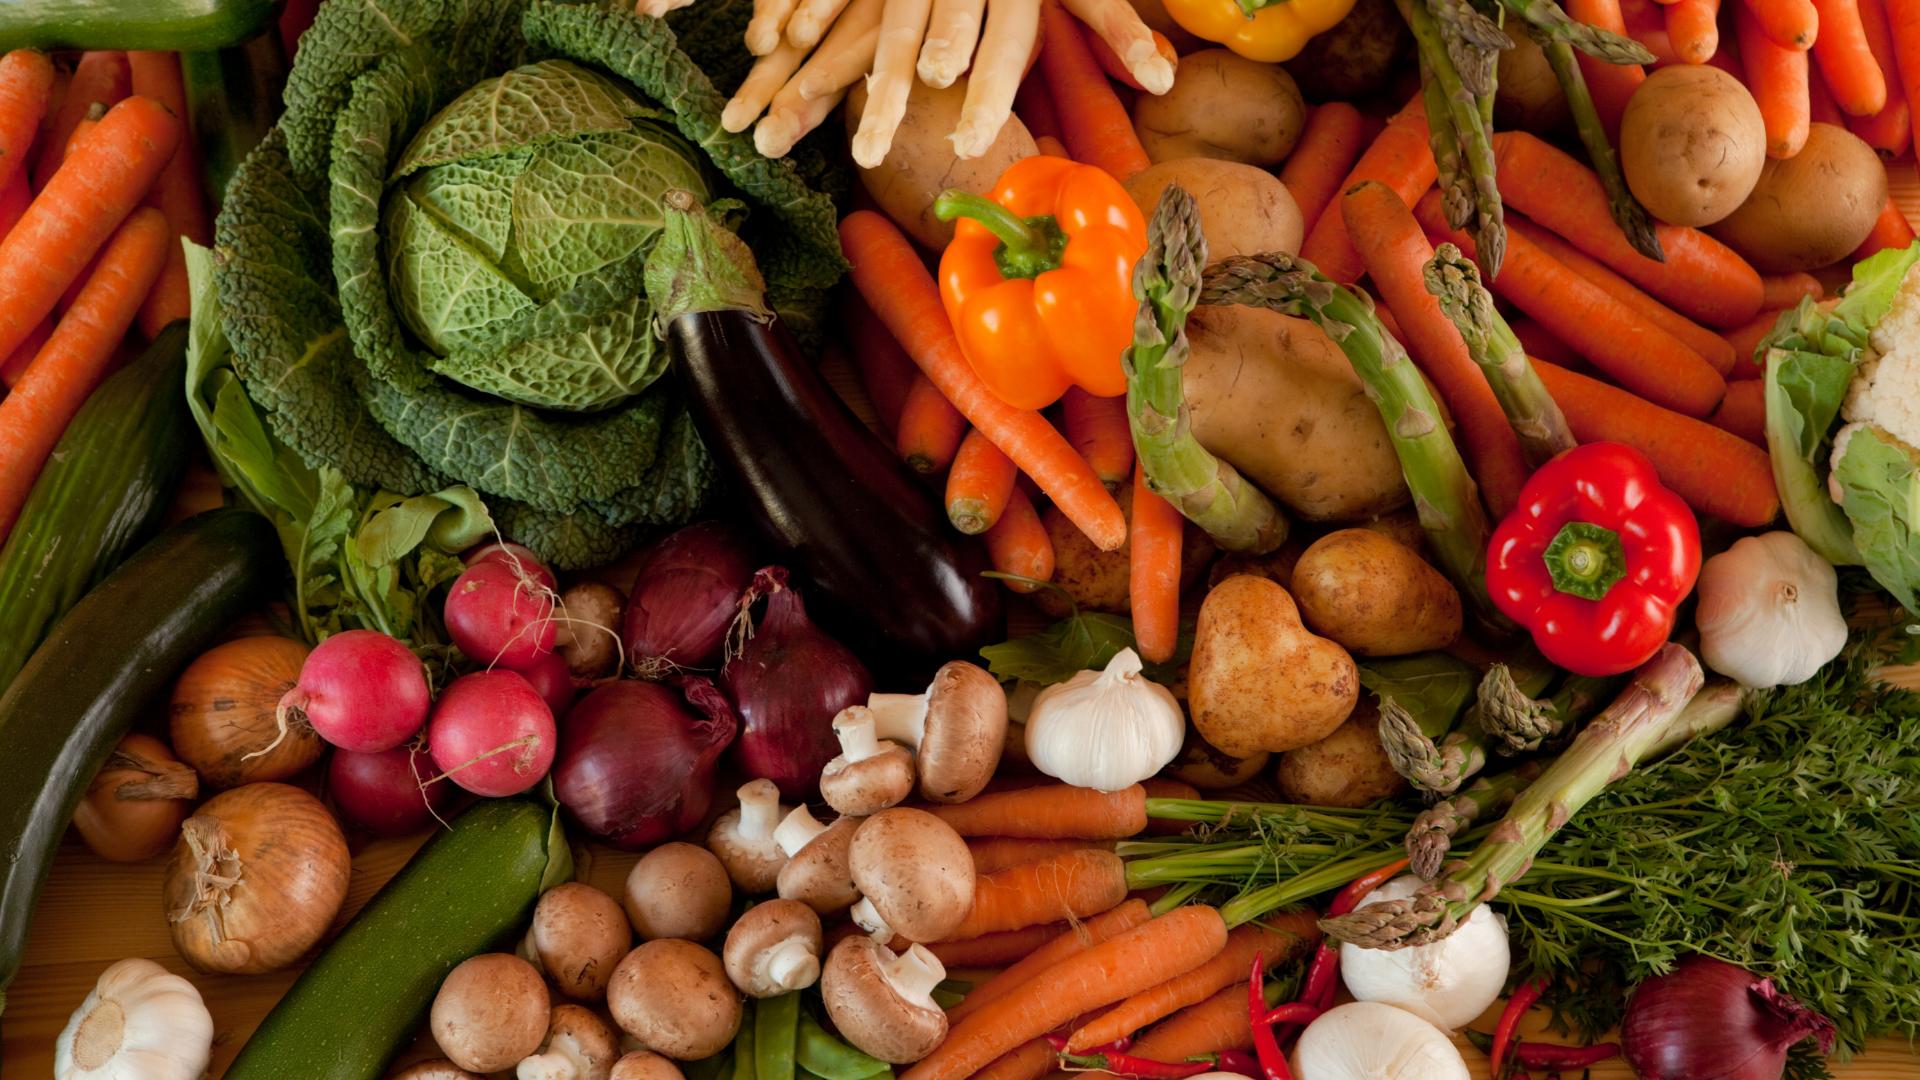 Sustainable glyphosate use in Australian vegetable production